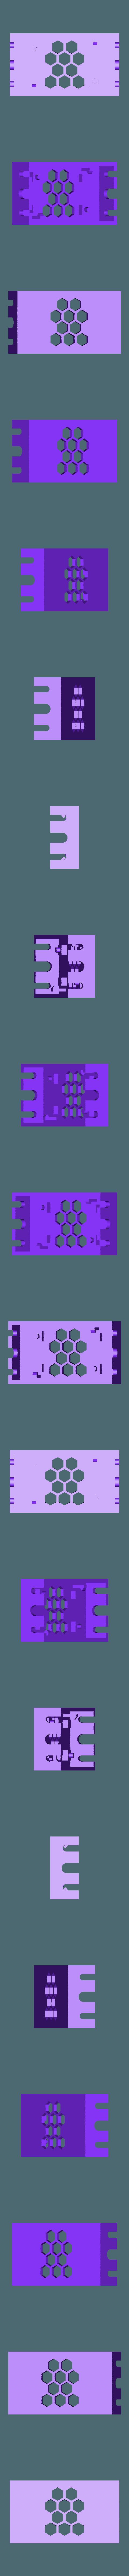 Base-Clipless-v2.stl Download free STL file LM2596 and LM2596S Buck converter tool-less snap-fit enclosure - Ender, CR-10, 2020 • 3D printer template, FedorSosnin